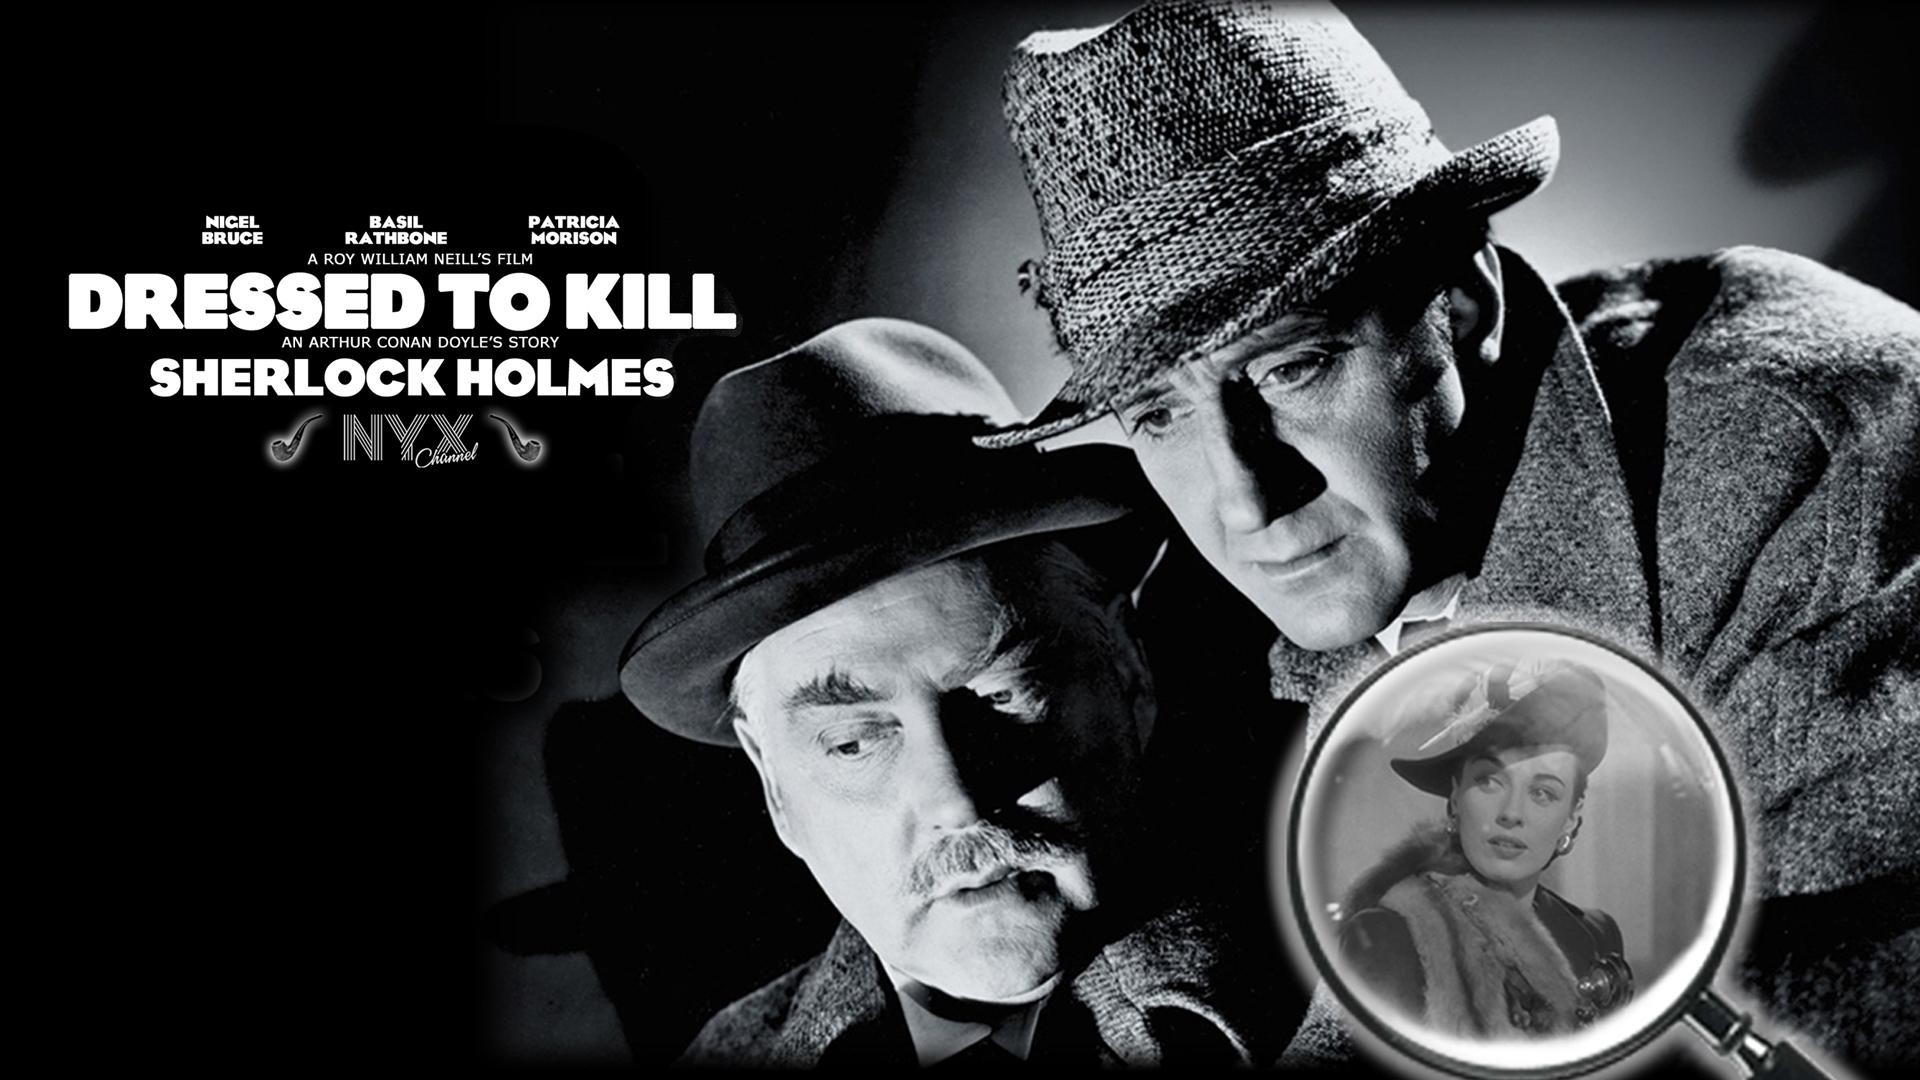 Sherlock Holmes - Dressed to Kill